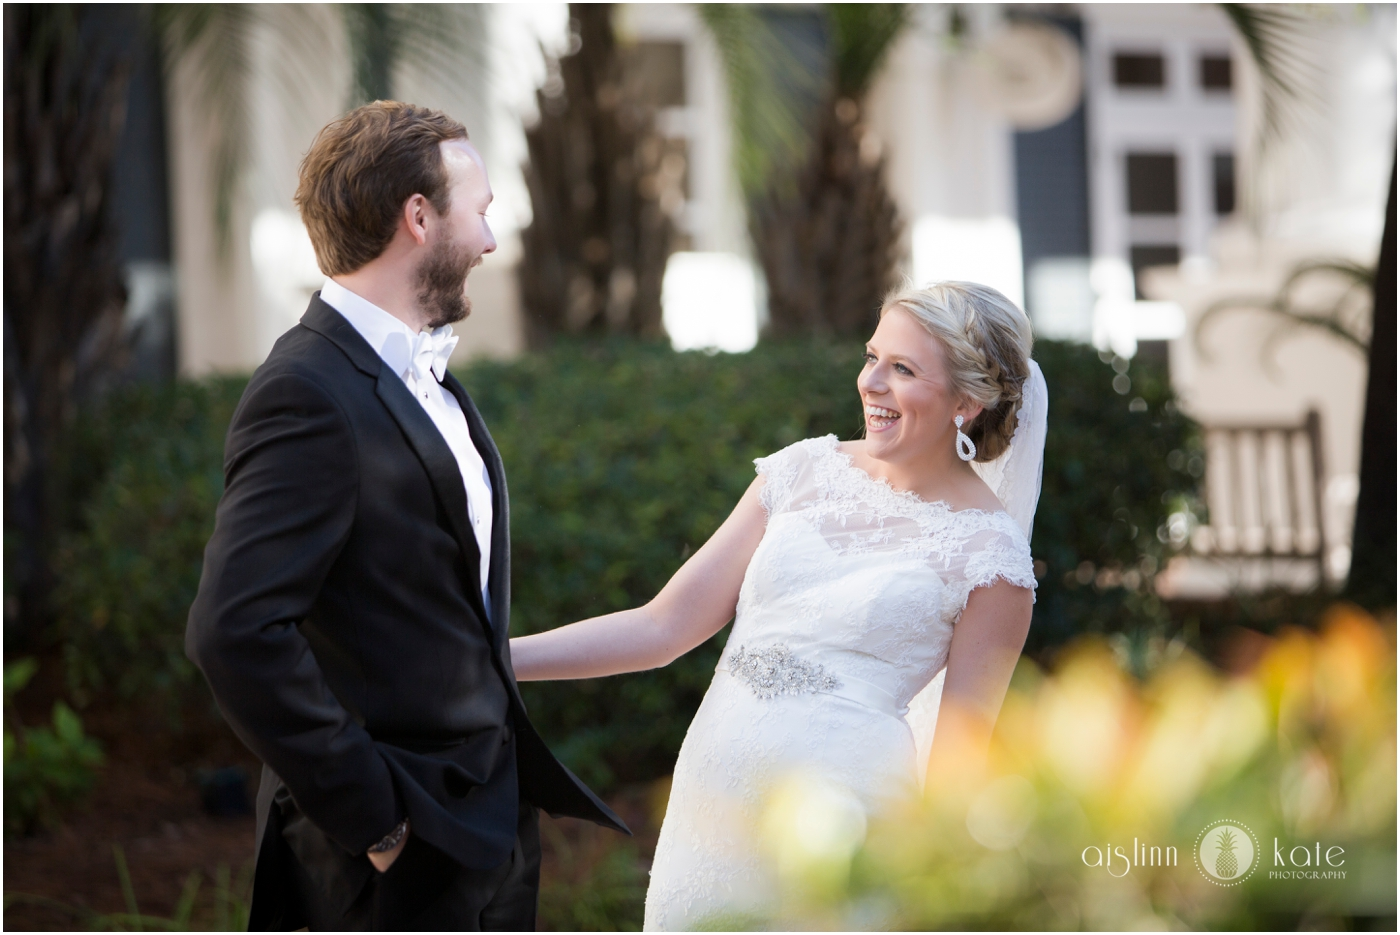 Pensacola-Destin-Wedding-Photographer_9585.jpg